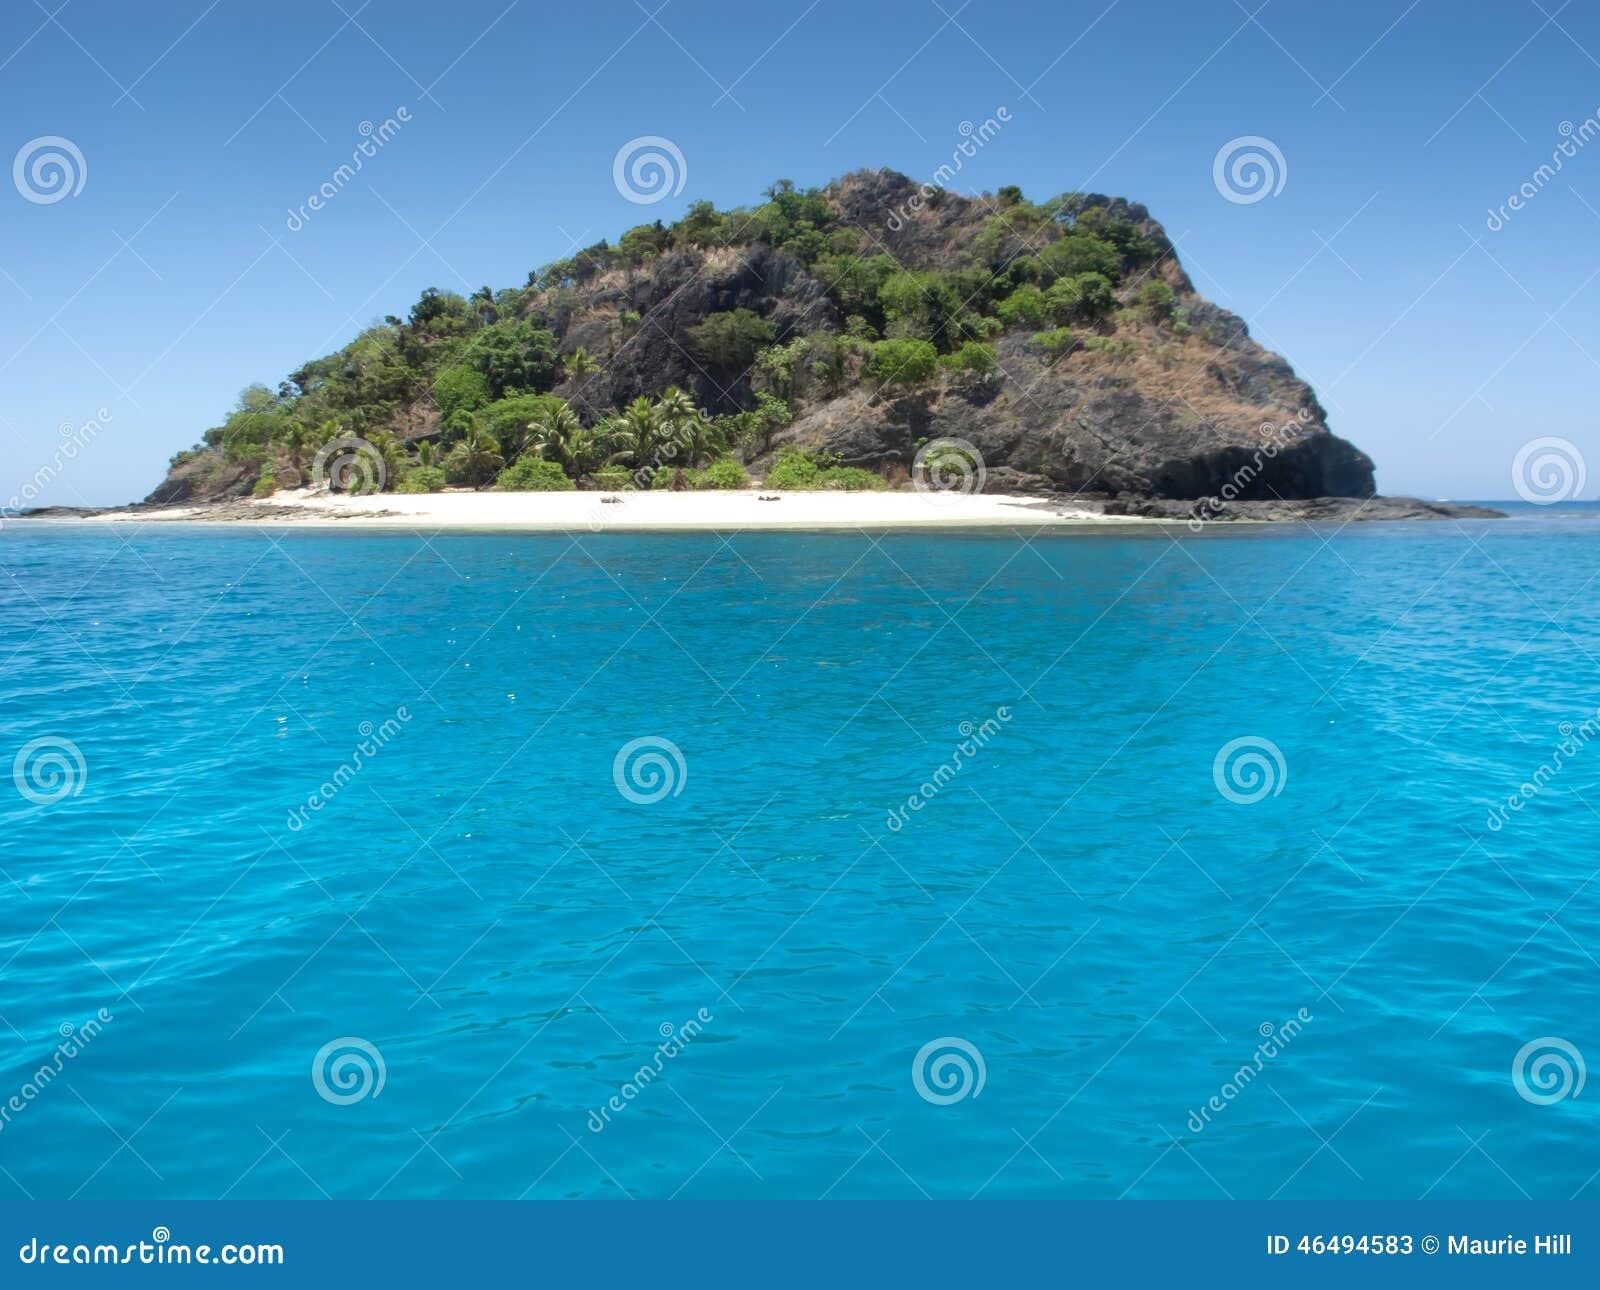 Tropical Island Sun: Tropical Island In The Sun Stock Photo